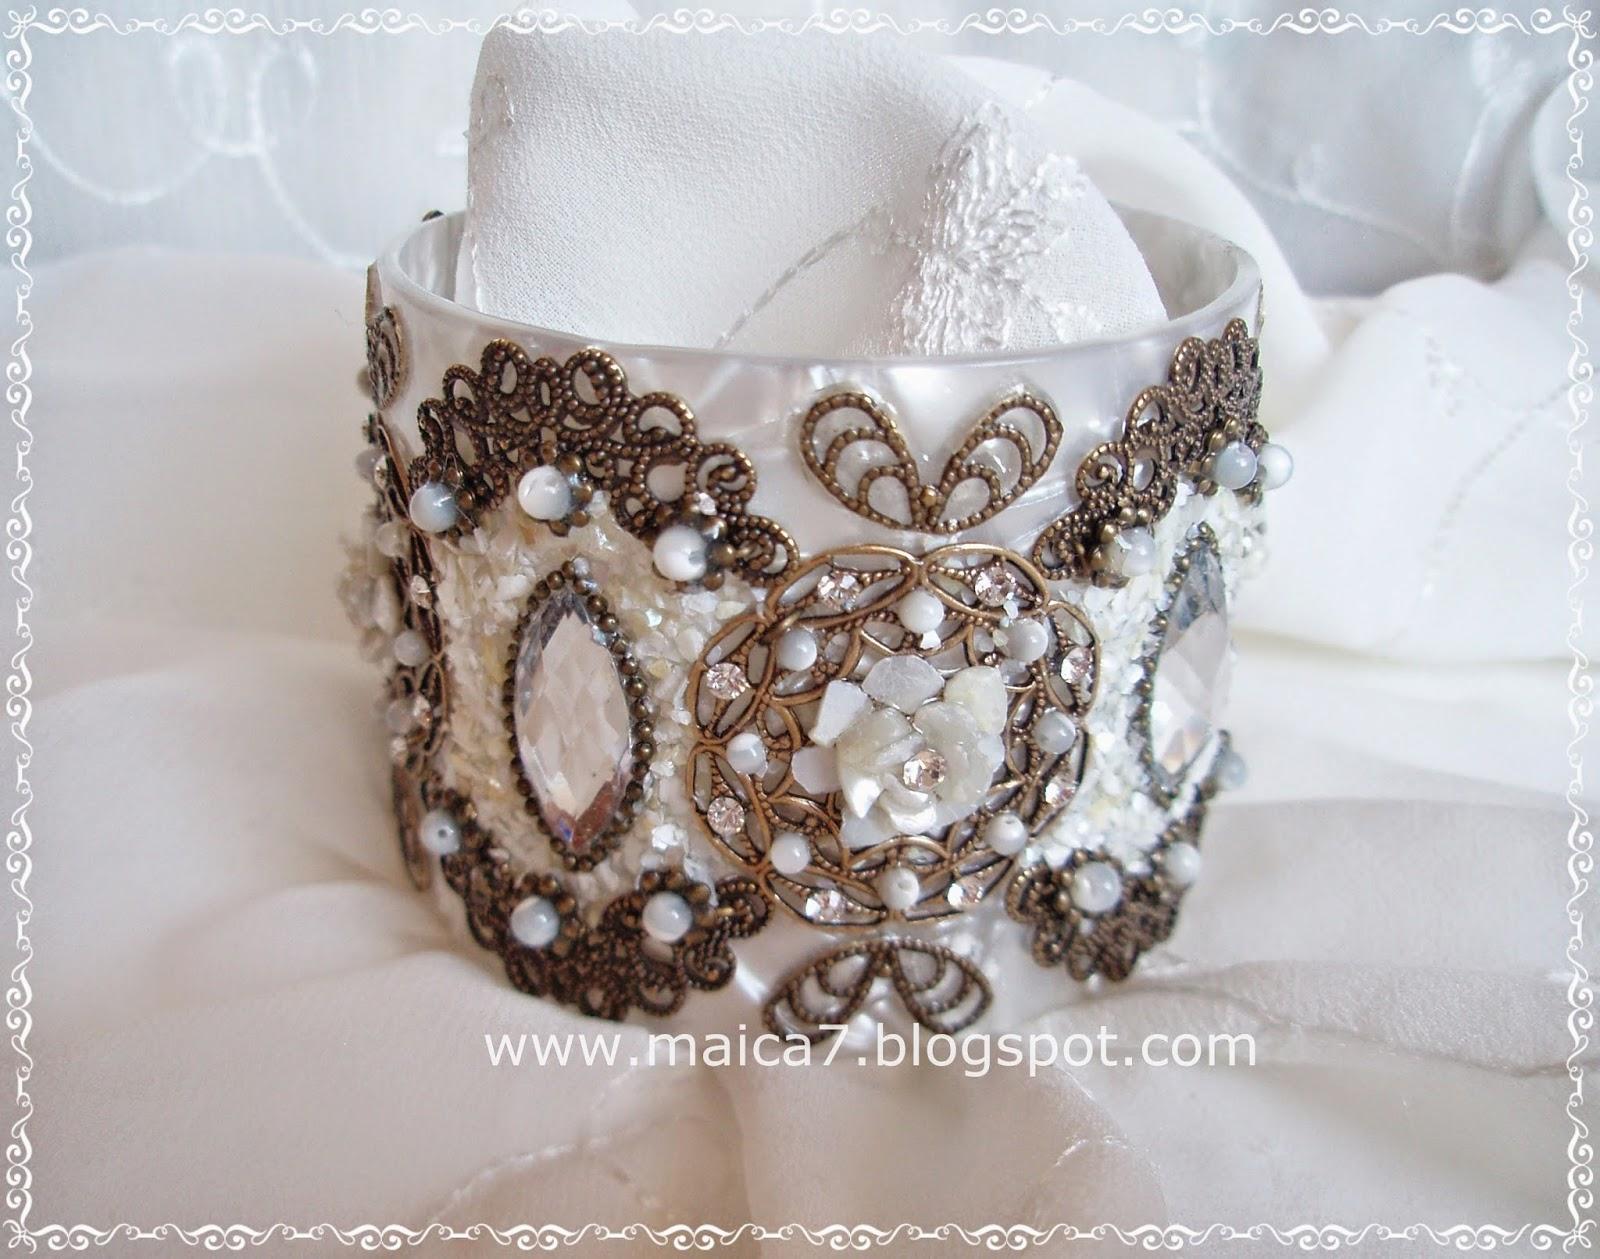 15d8e684e4b1 Complementos para novias  pendientes y tocados. Bisutería artesanal ...